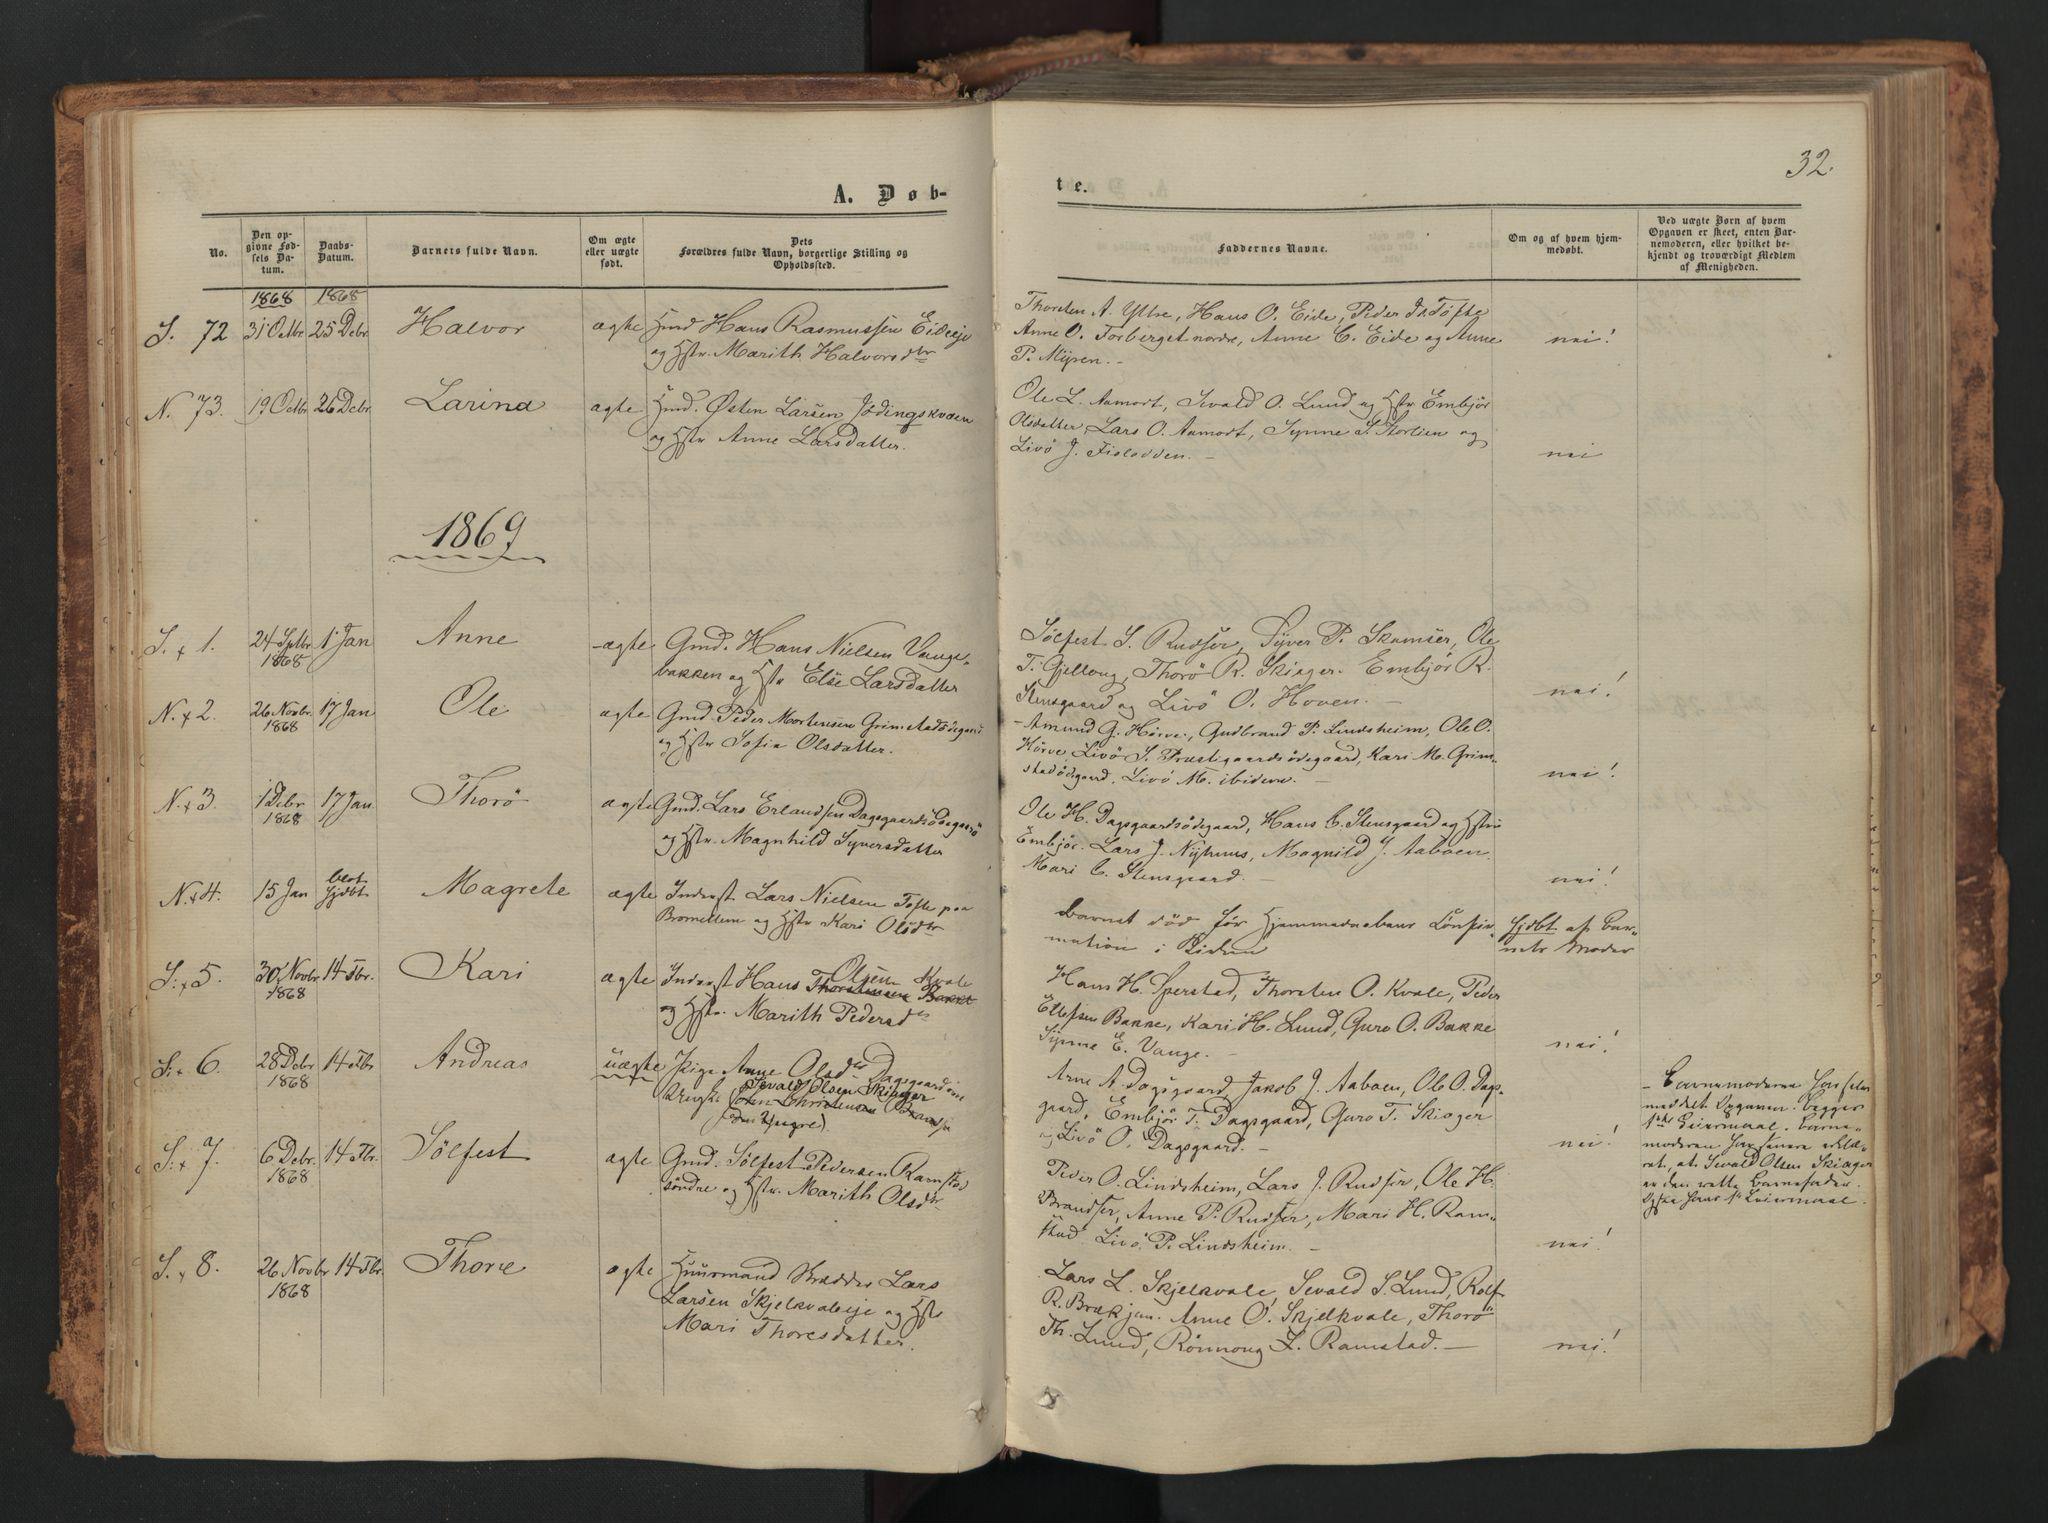 SAH, Skjåk prestekontor, Ministerialbok nr. 1, 1863-1879, s. 32